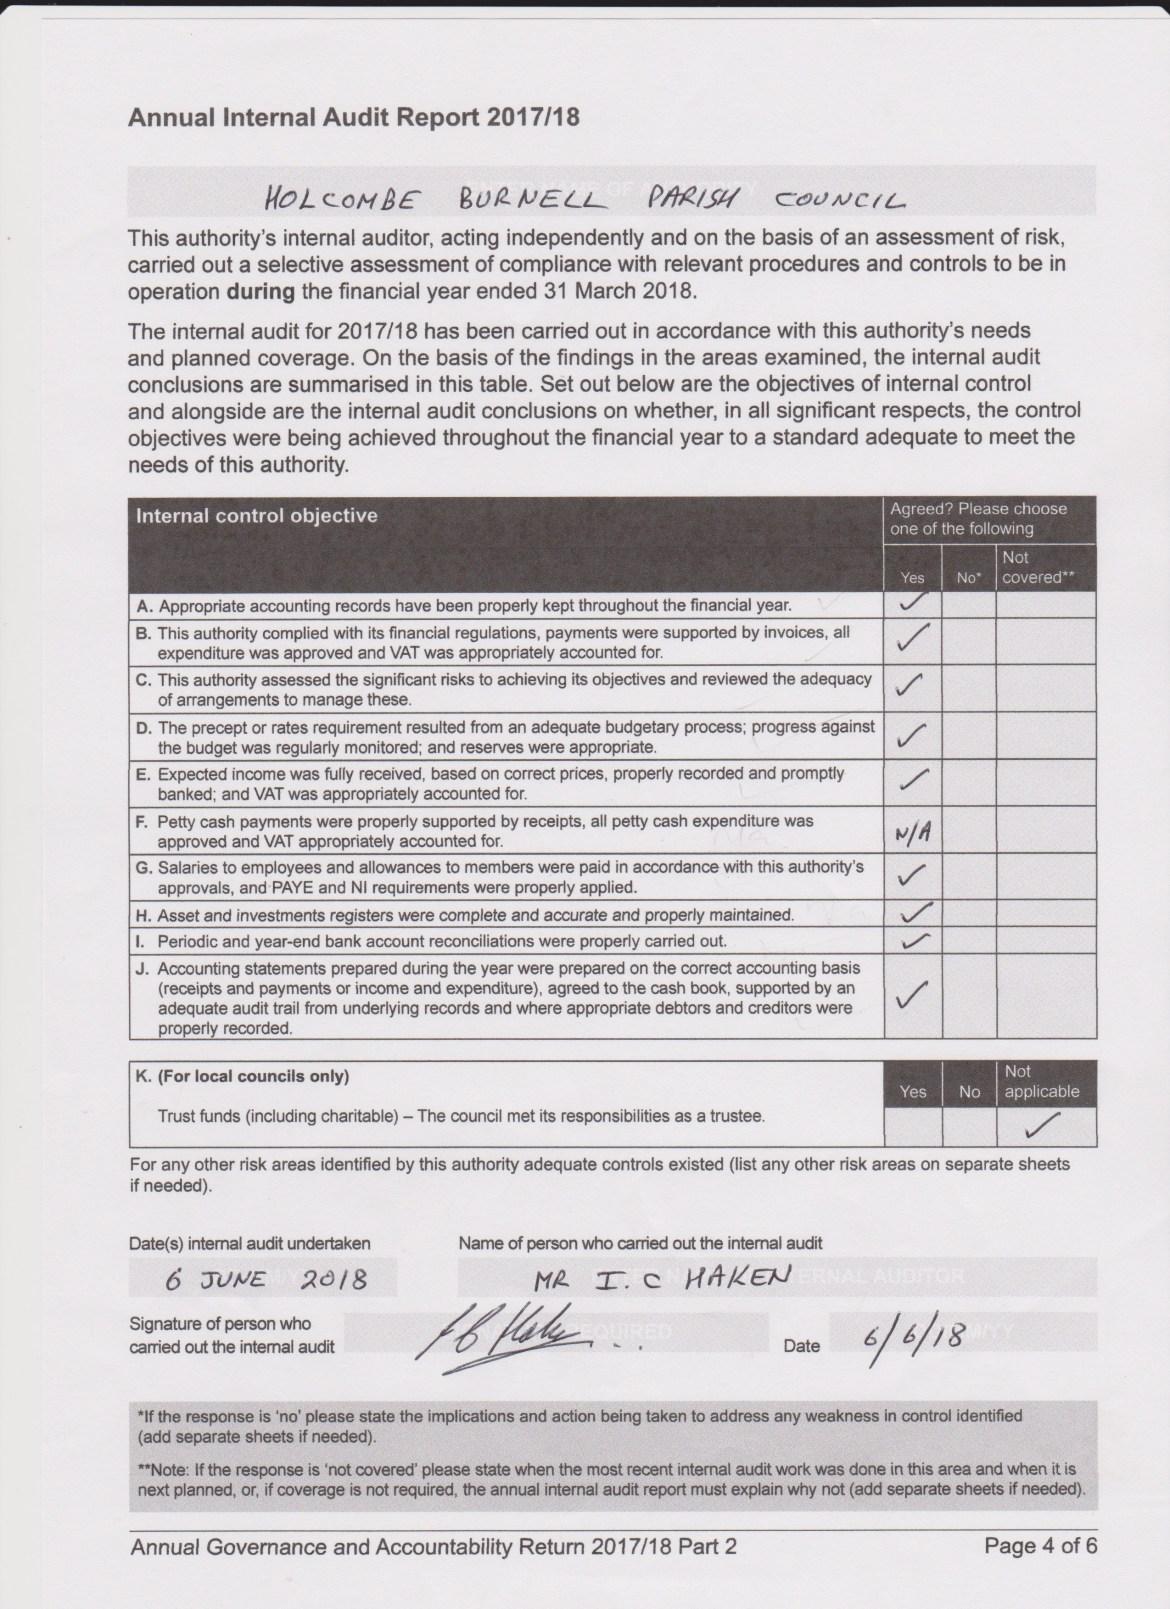 Annual Internal Audit form 2017-18